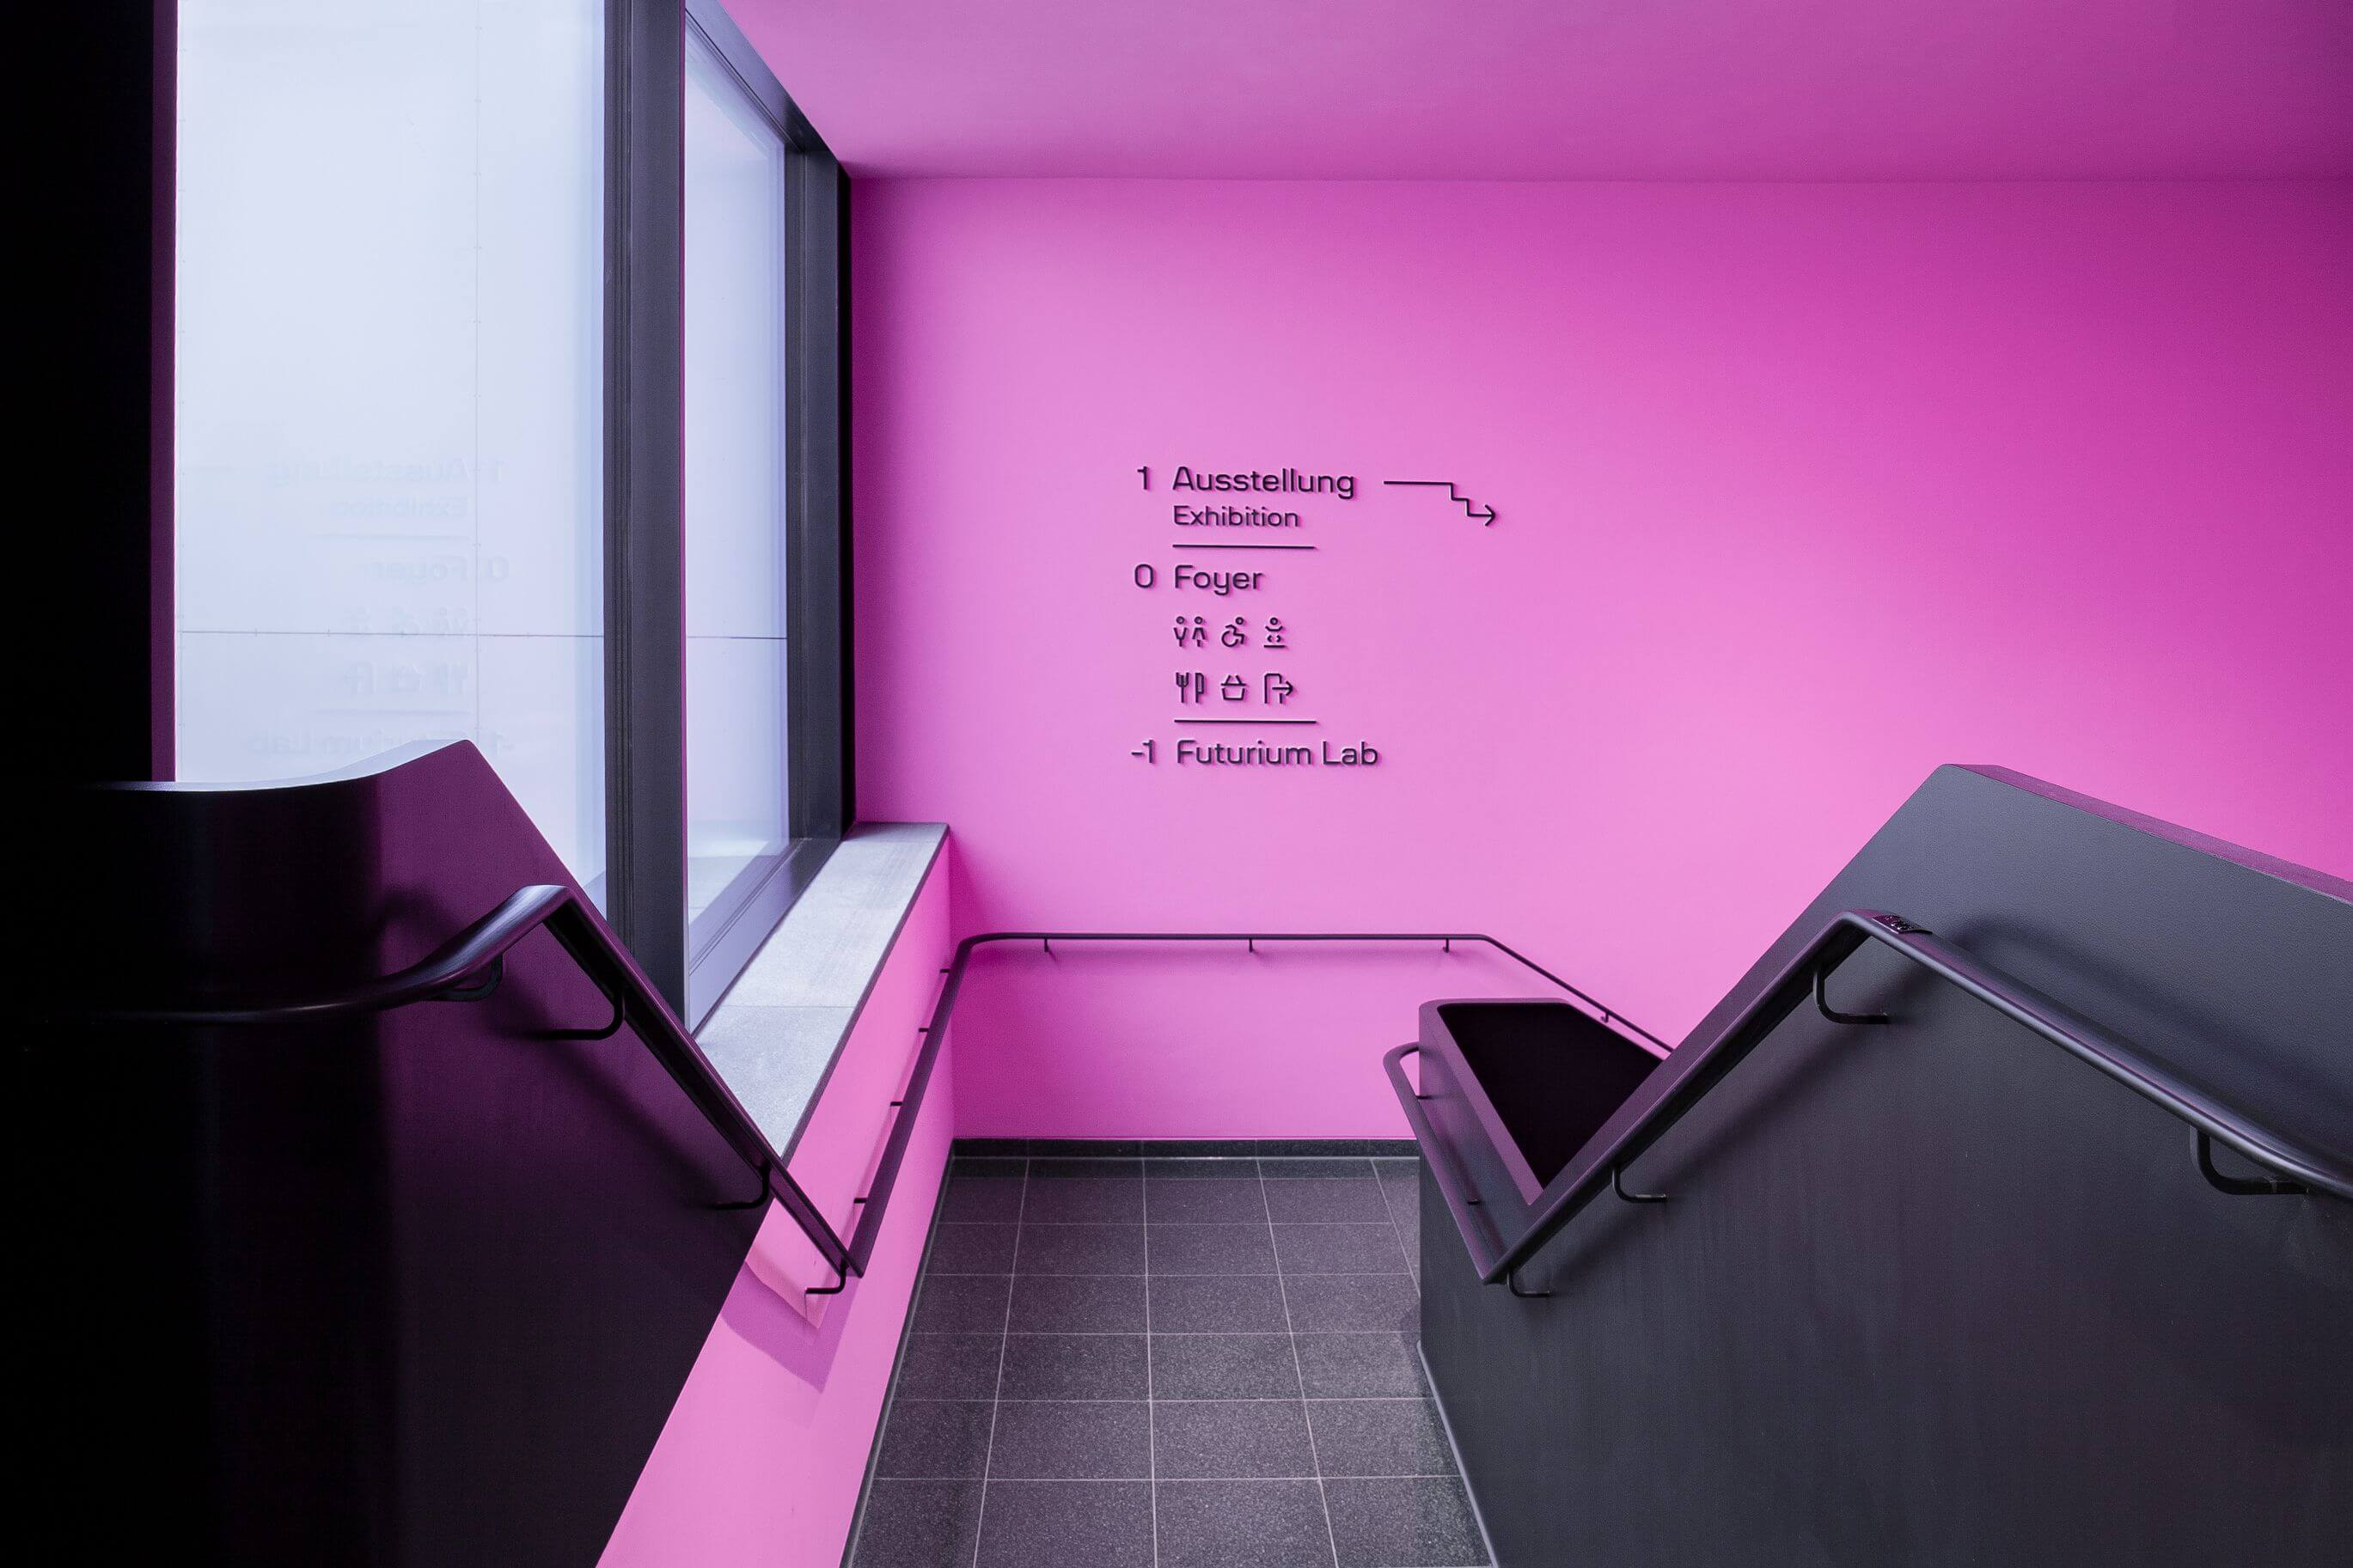 Malwin Béla Hürkey — Visual Communication Futurium — Wayfinding